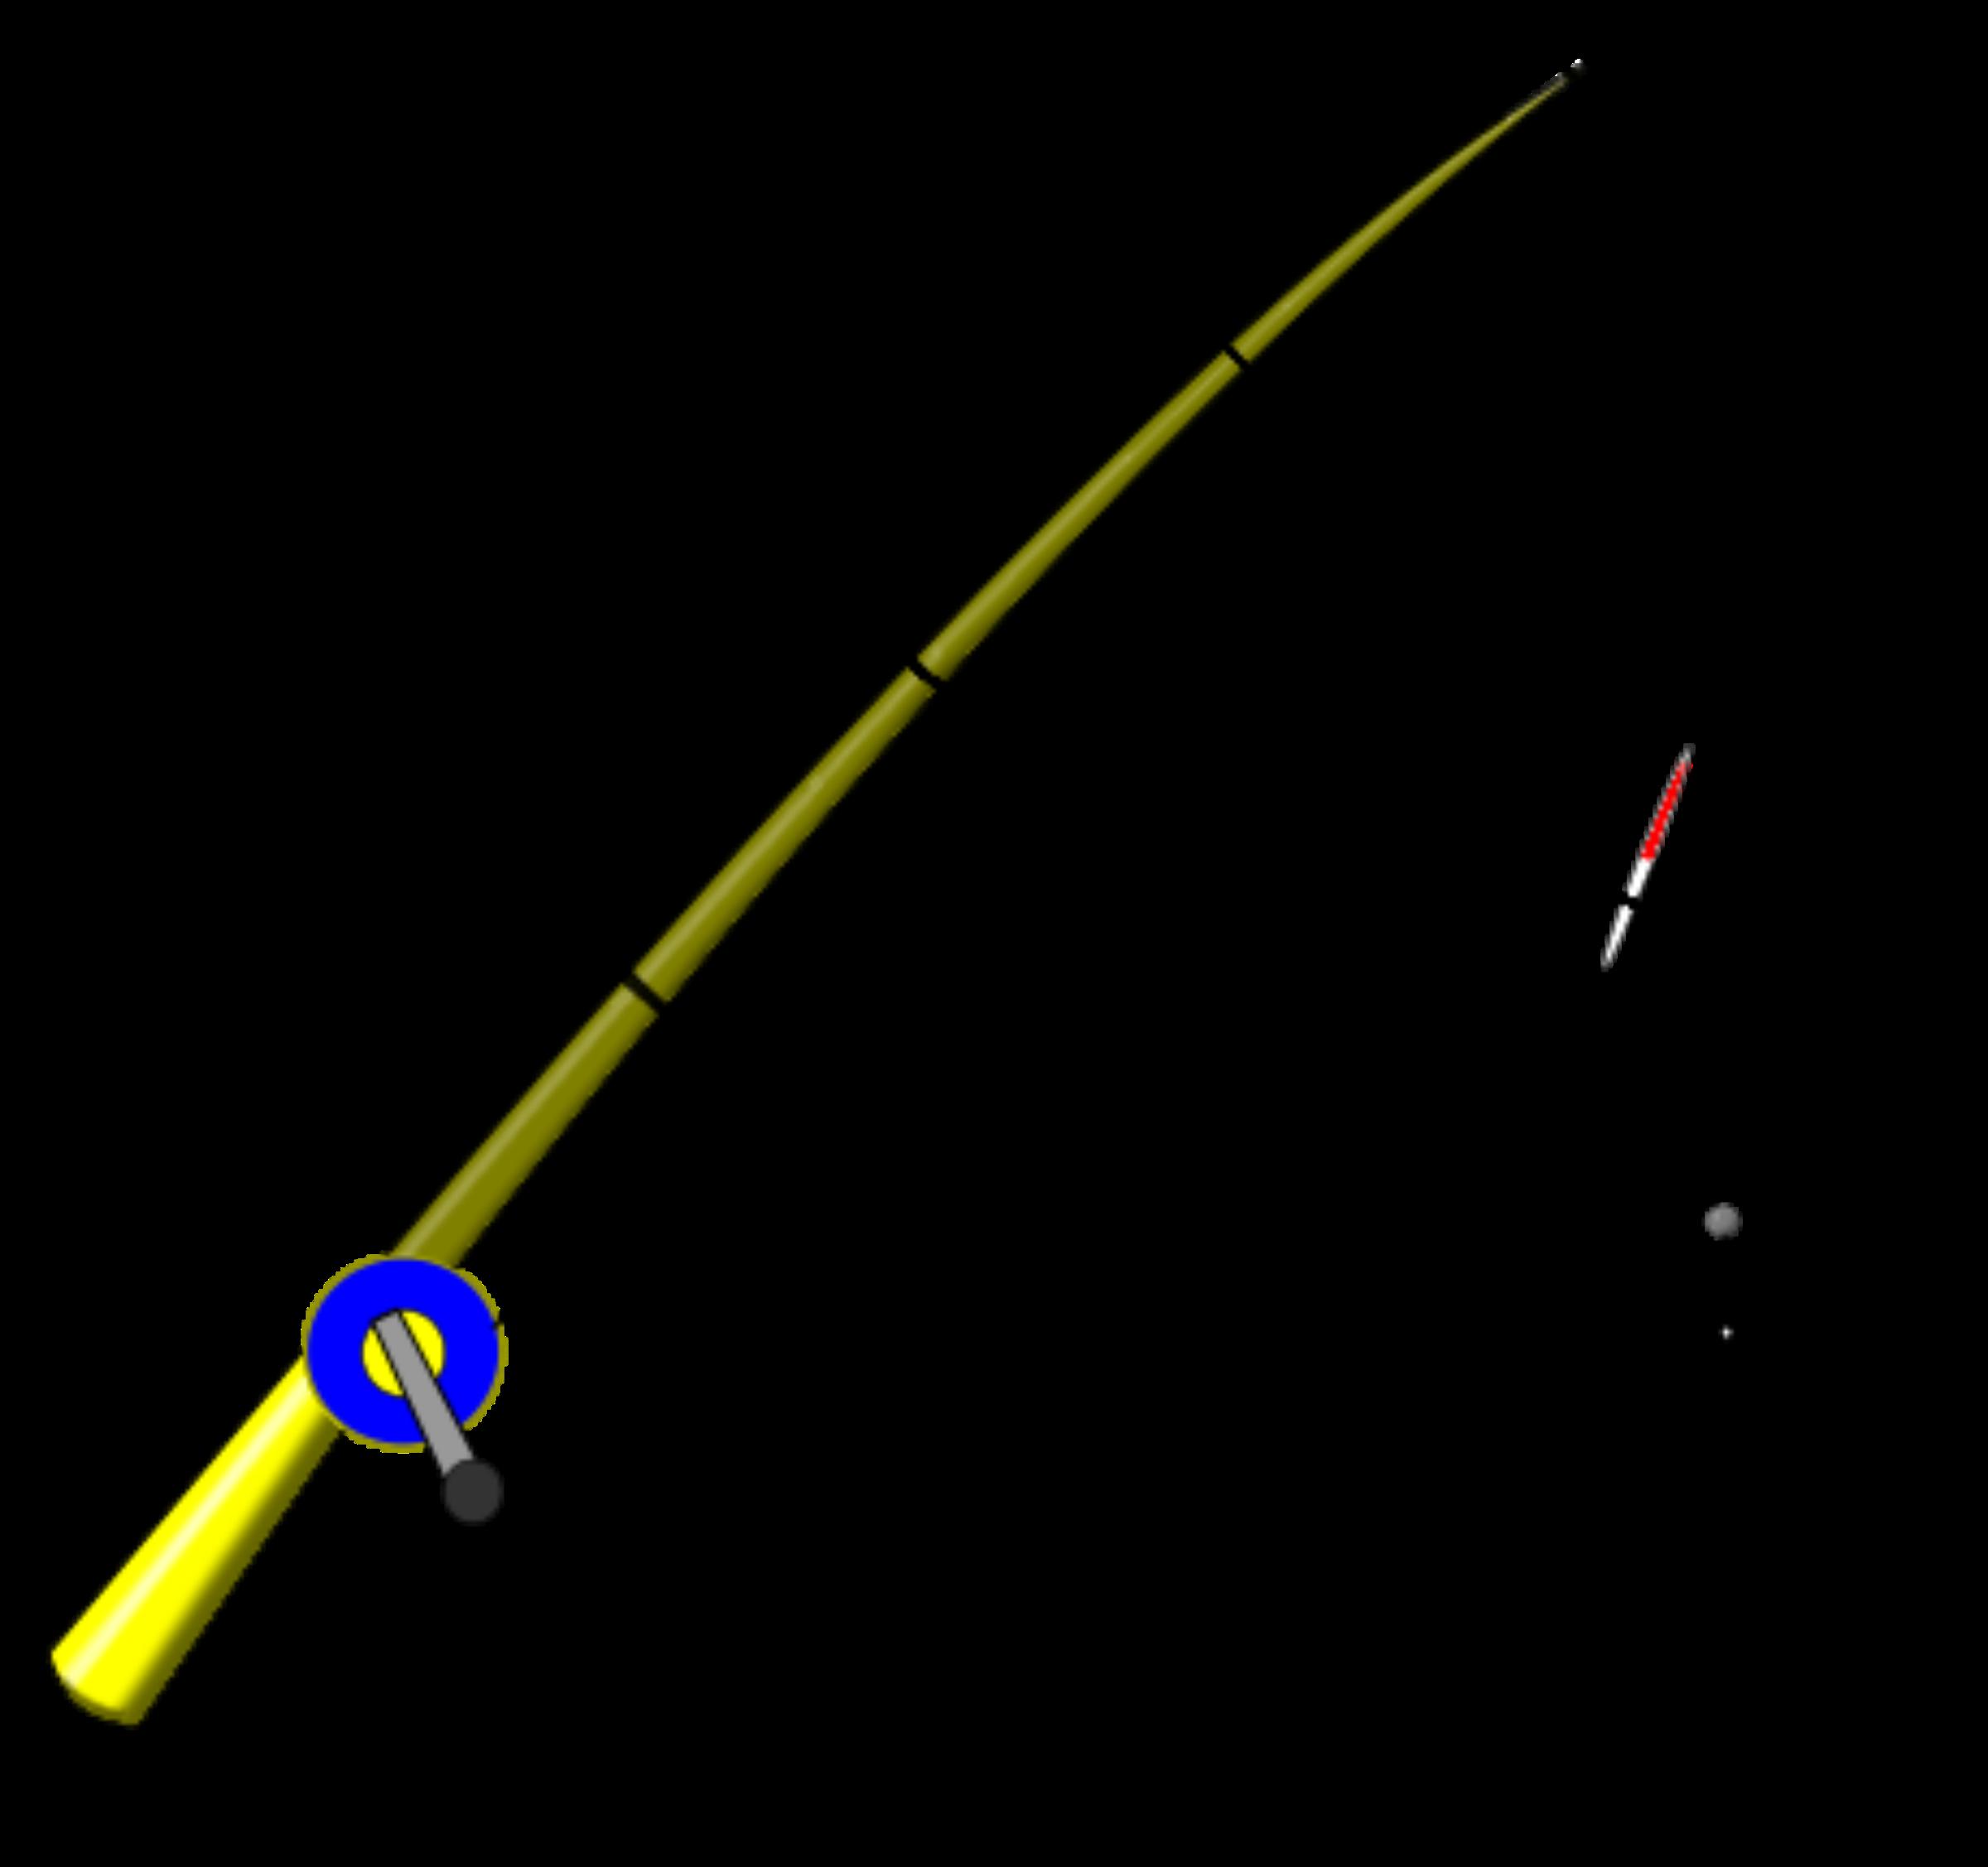 Fishing pole clipart fishing rod image 2